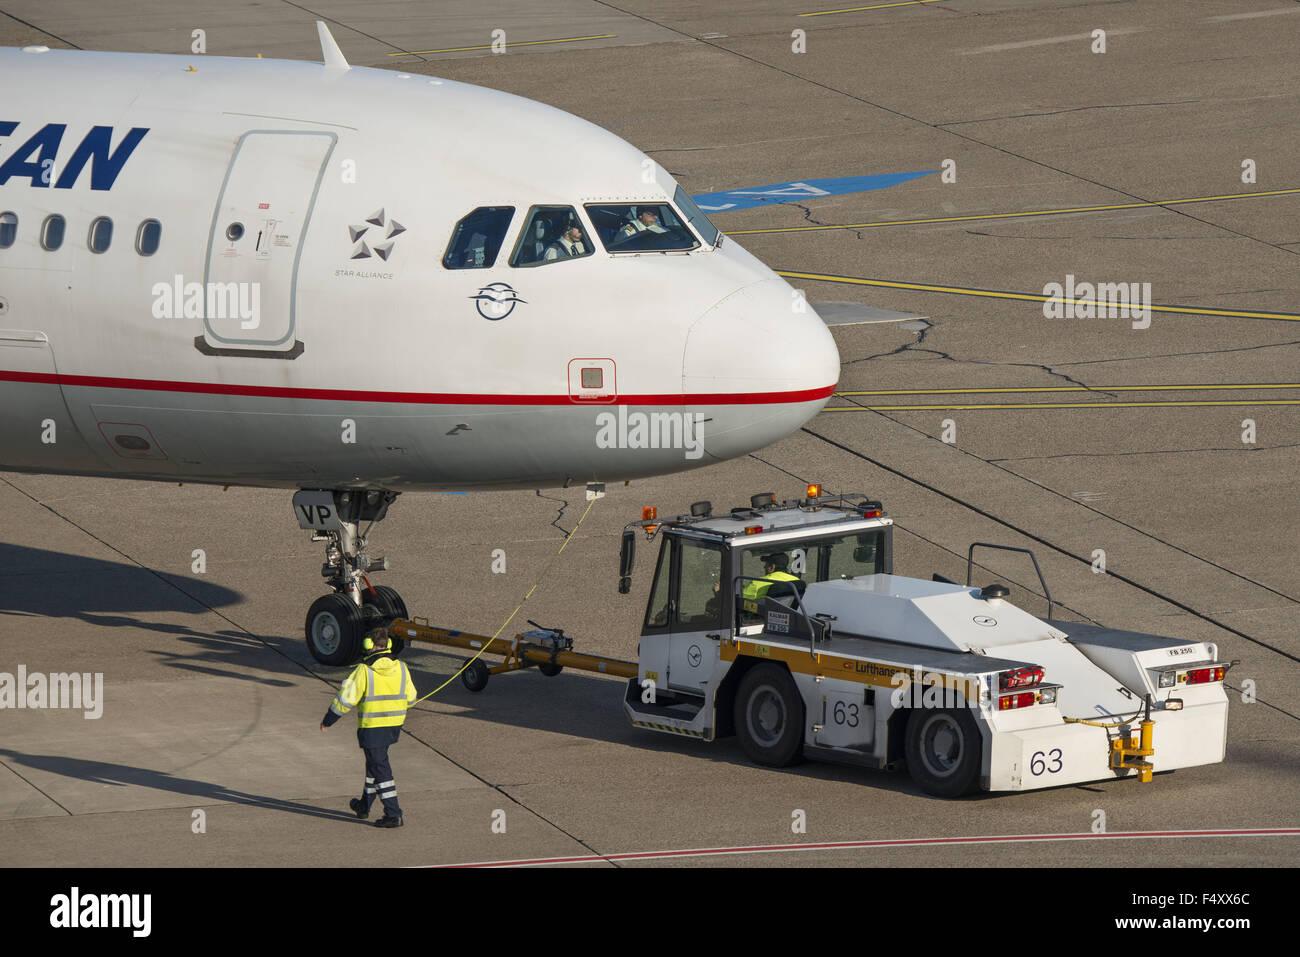 Aircraft during push-back, Düsseldorf airport, DUS, North Rhine-Westphalia, Germany - Stock Image